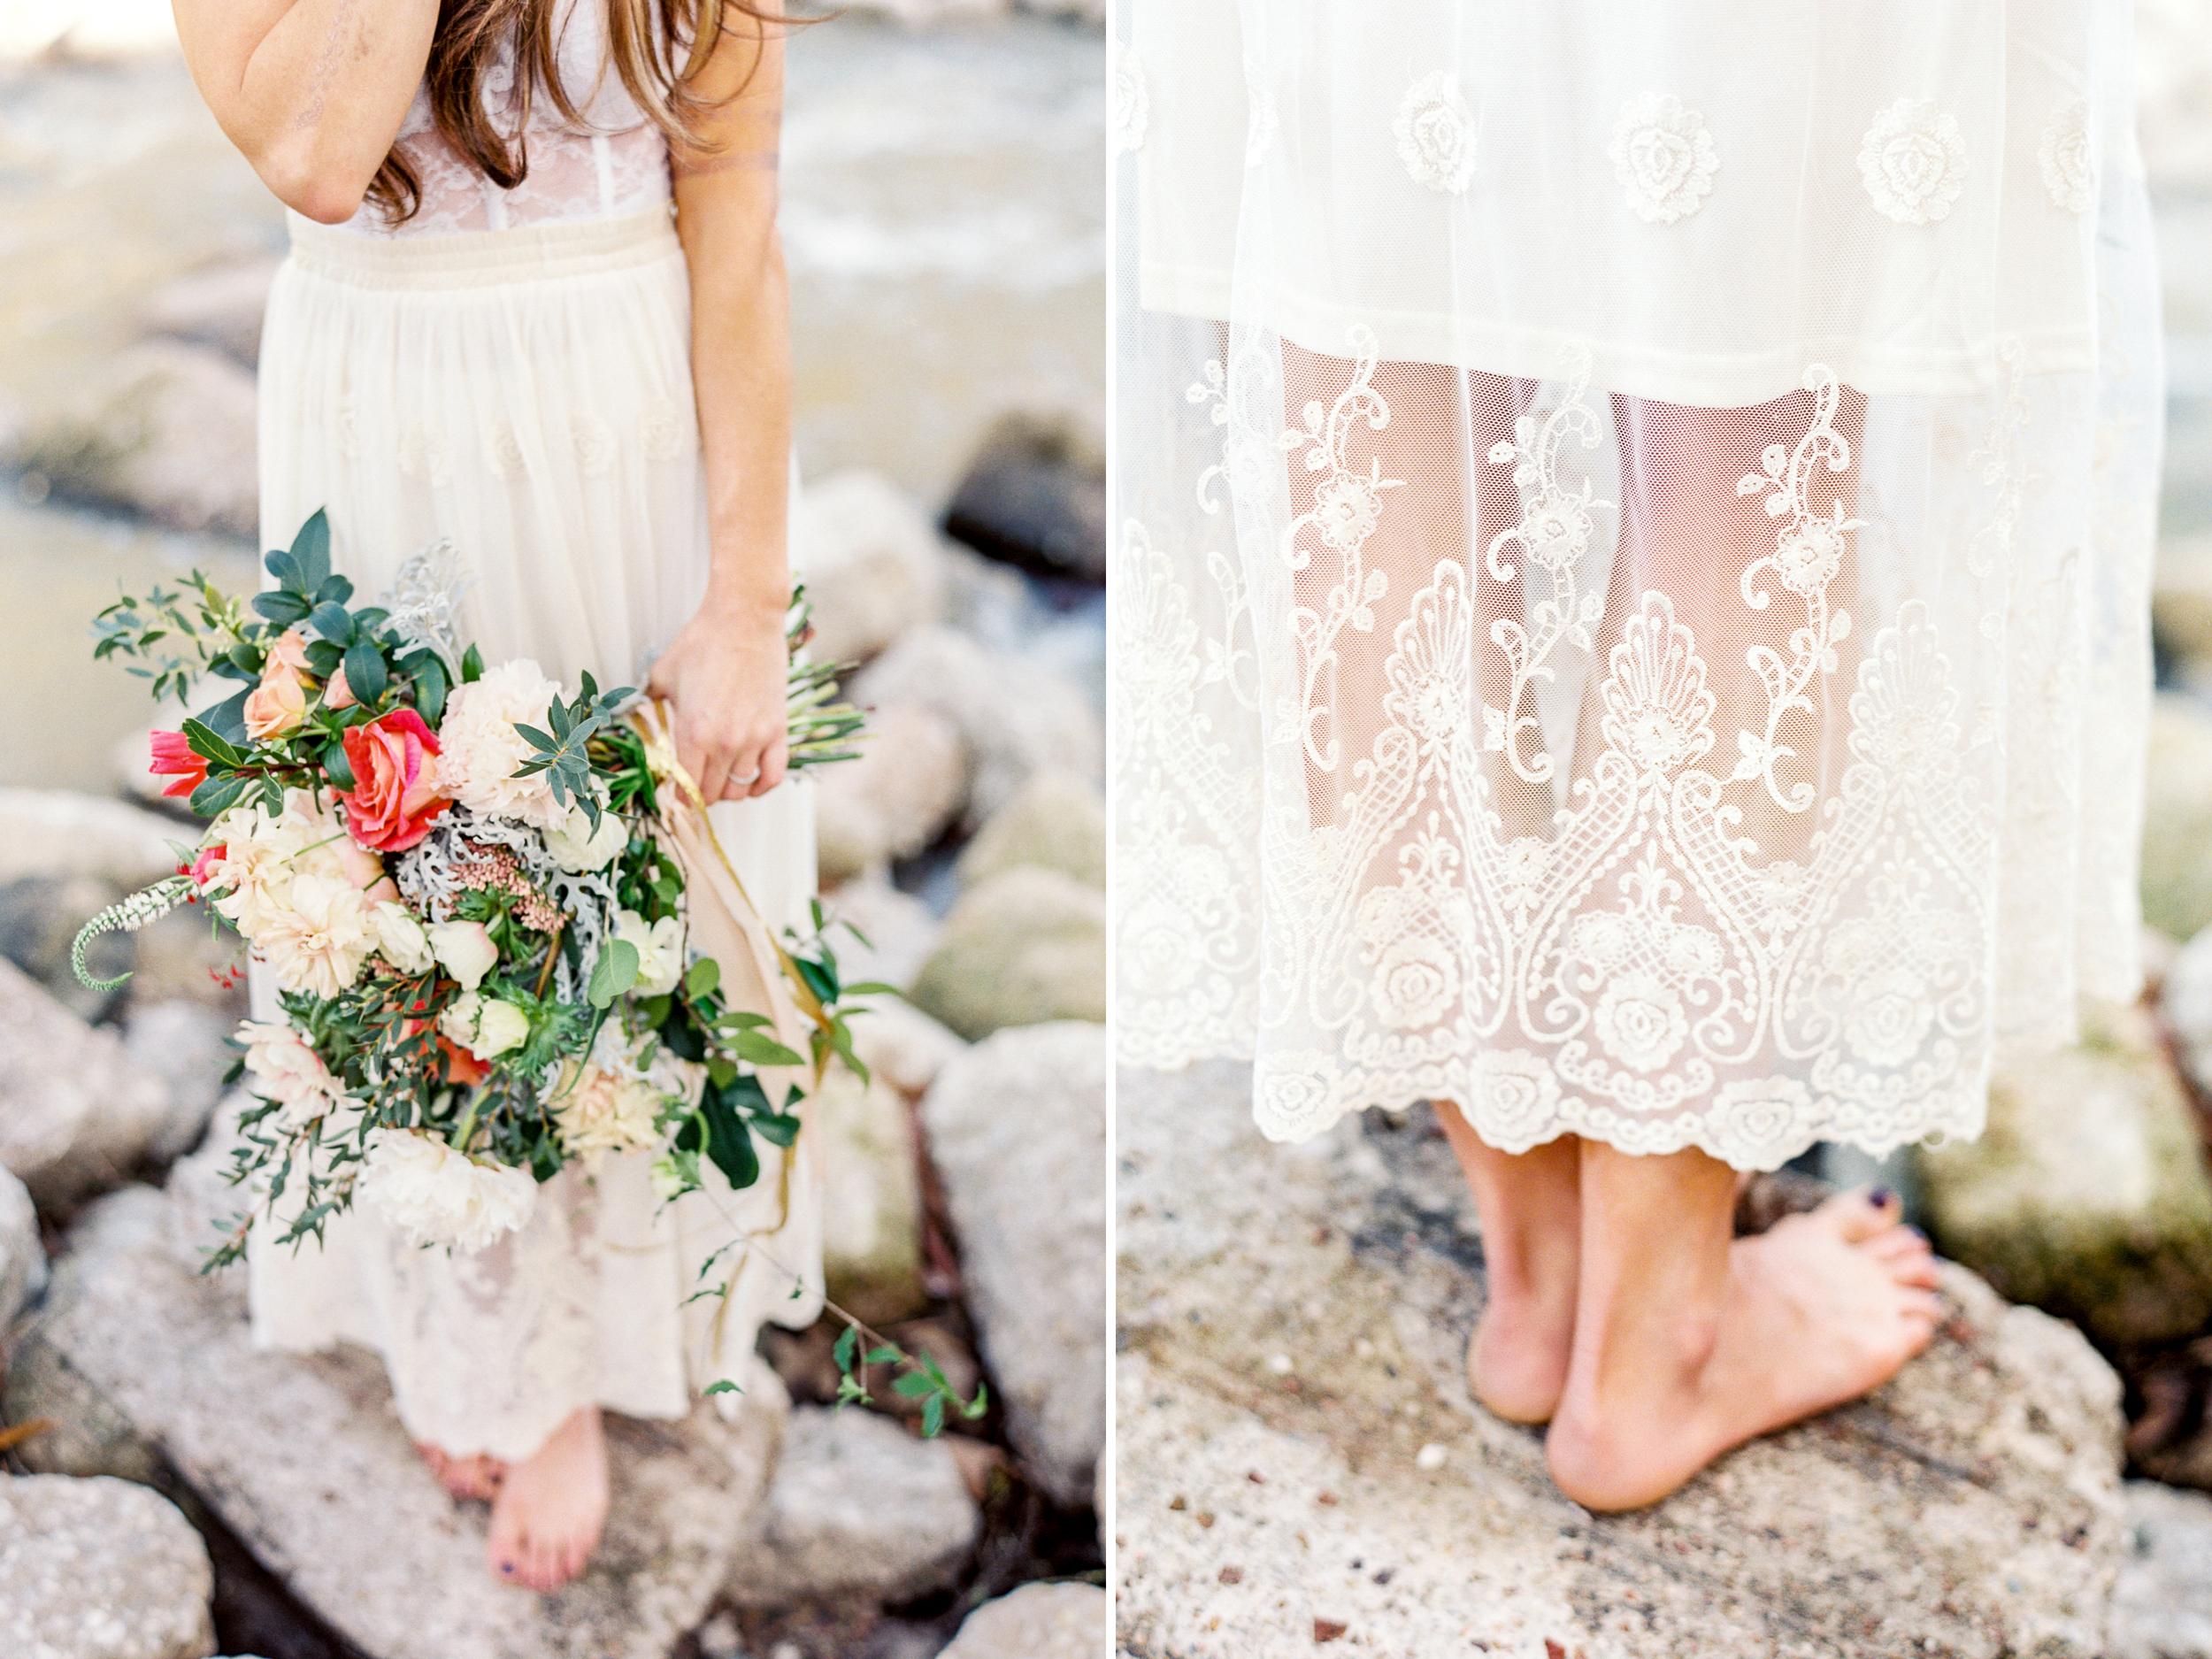 Dana Fernandez Photography Houston Film Wedding Photographer Destination Texas Boudoir-25.jpg